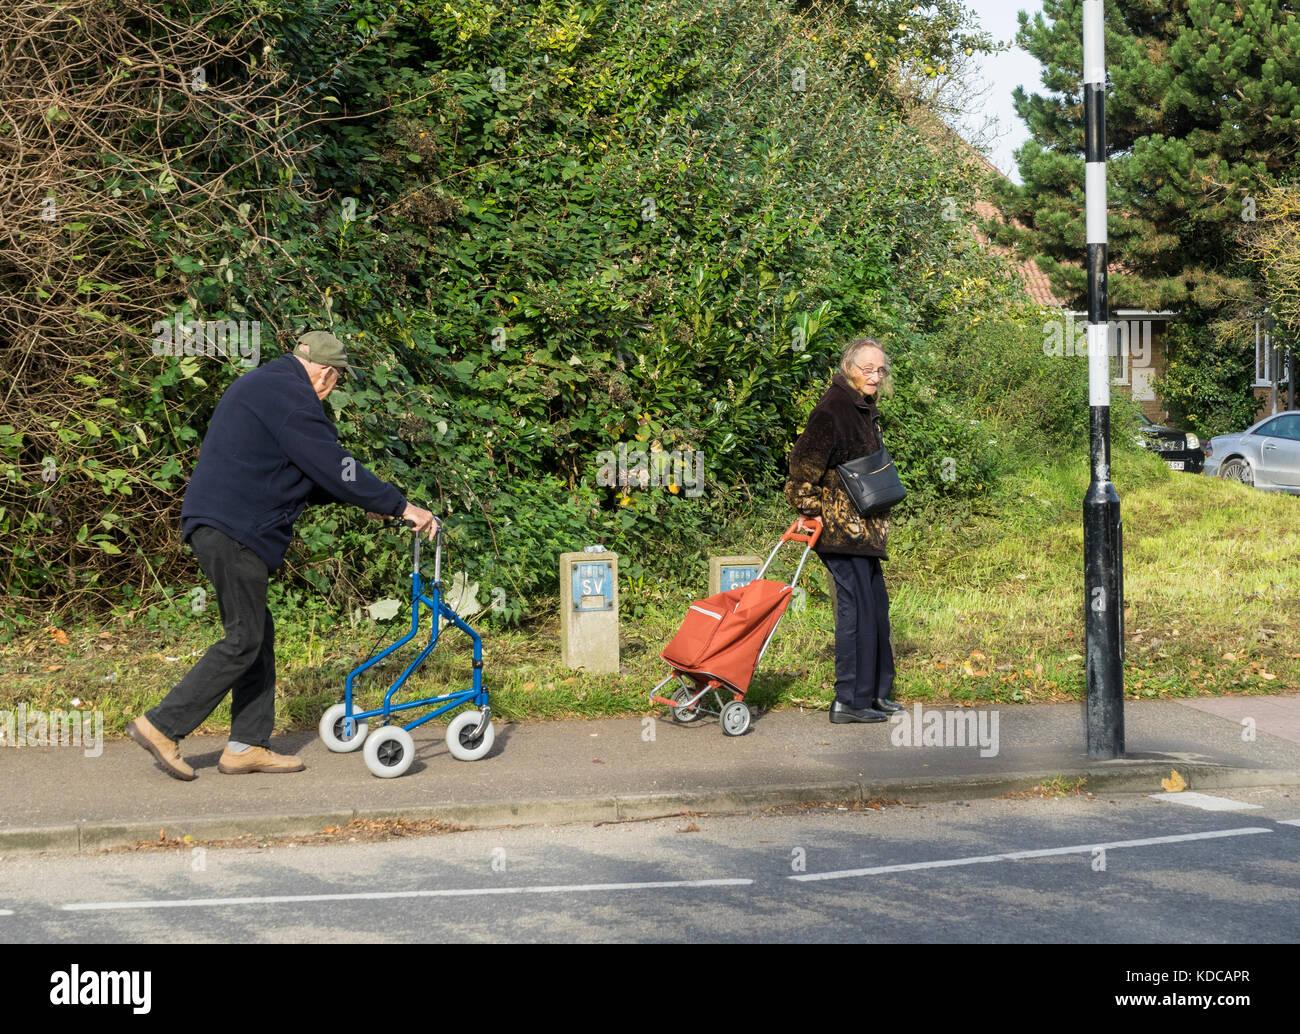 elderly-couple-with-shopping-KDCAPR.jpg